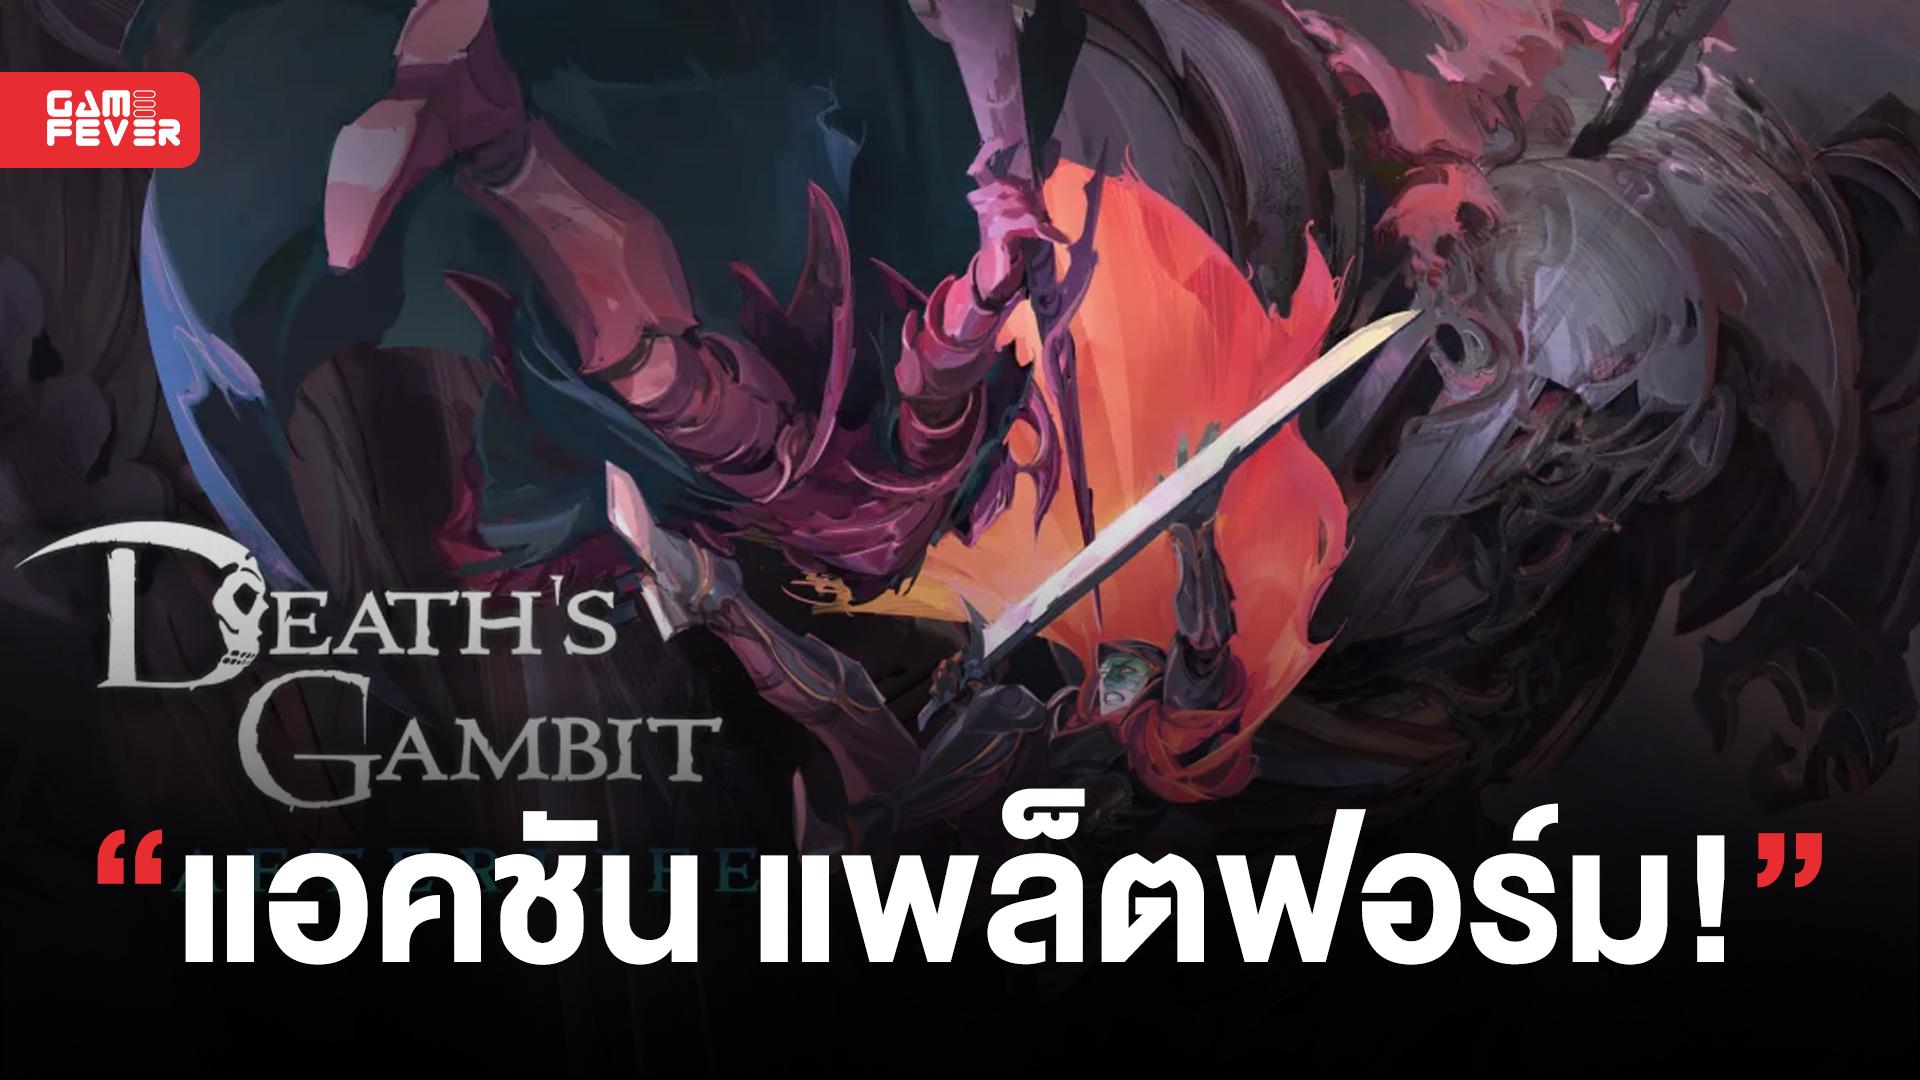 Death's Gambit: Afterlife เกมแอคชัน 2D แพล็ตฟอร์ม งานภาพสไตล์ Pixel Art เตรียมวางจำหน่าย 30 กันยายนนี้!